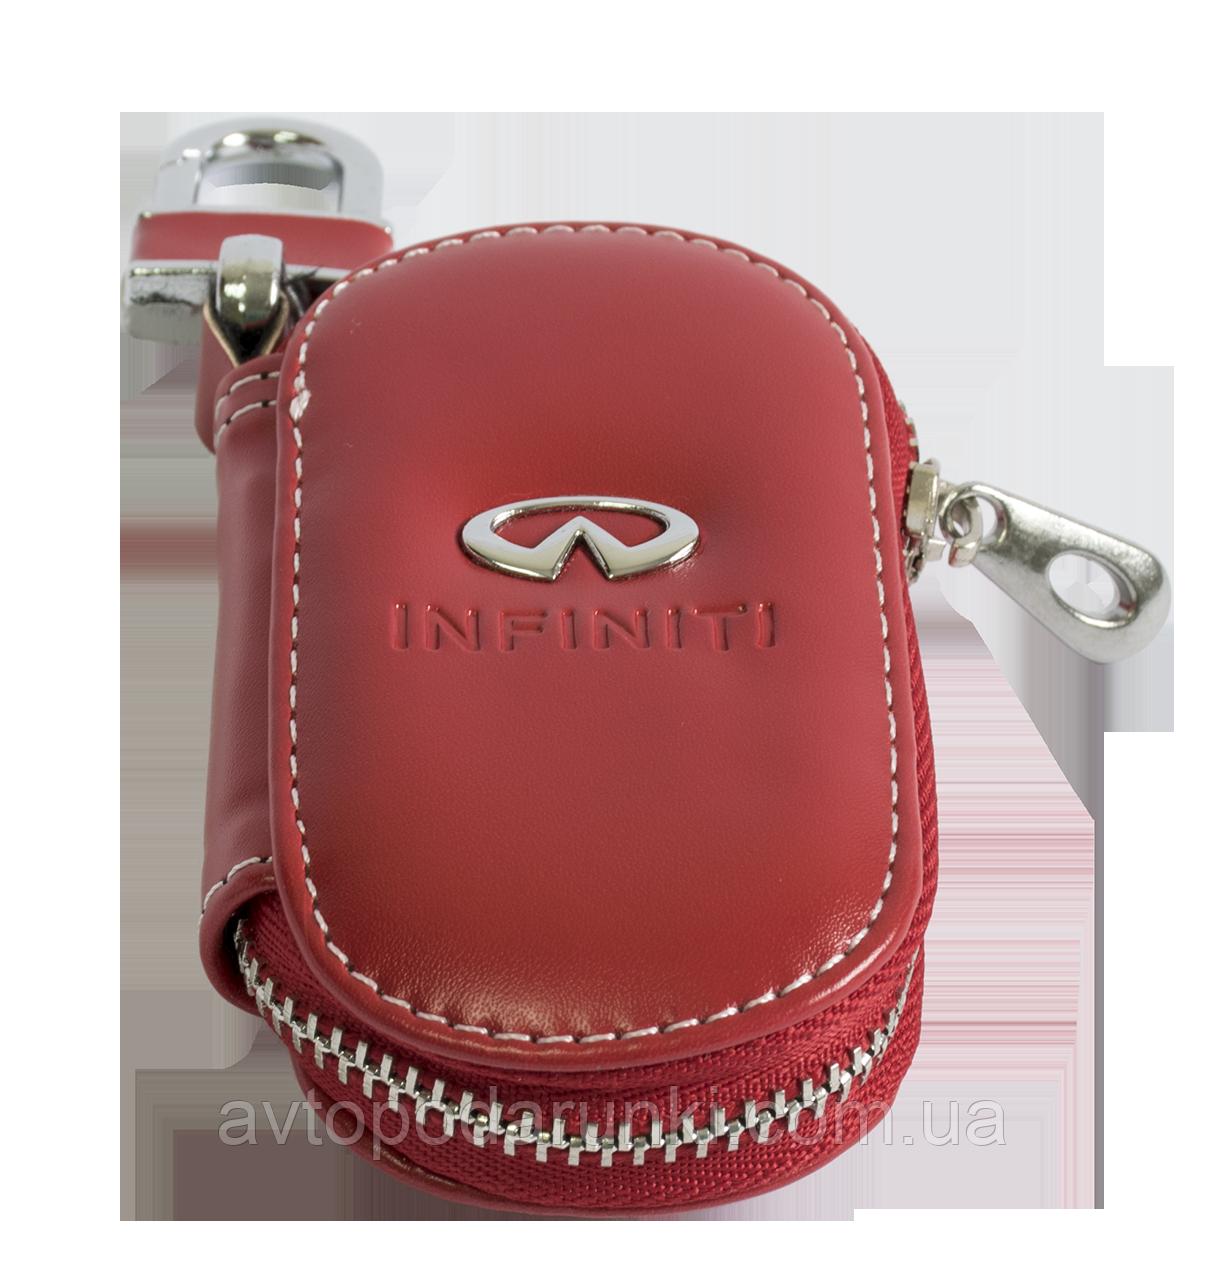 Ключница Carss с логотипом INFINITY 25015 красная